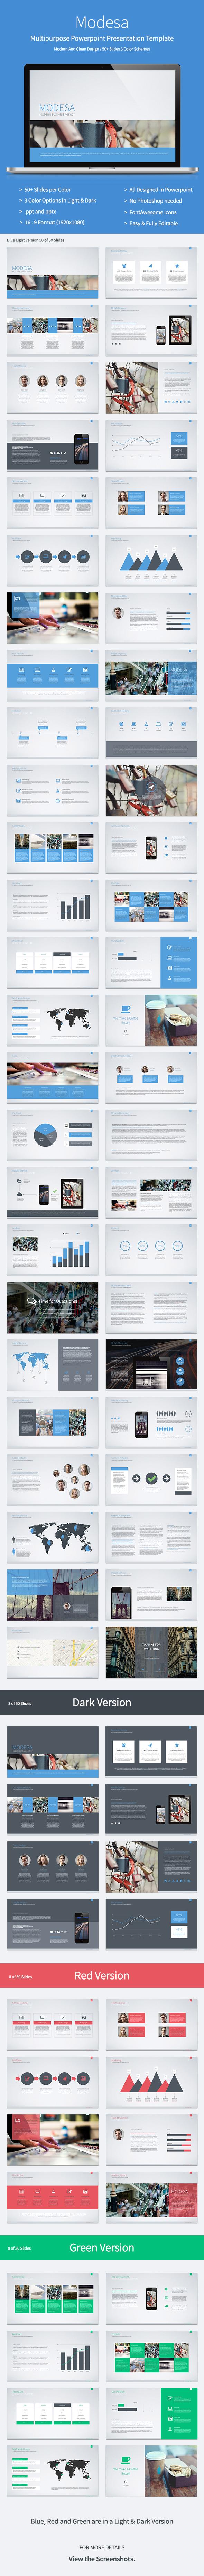 Modesa Powerpoint Multipurpose Template